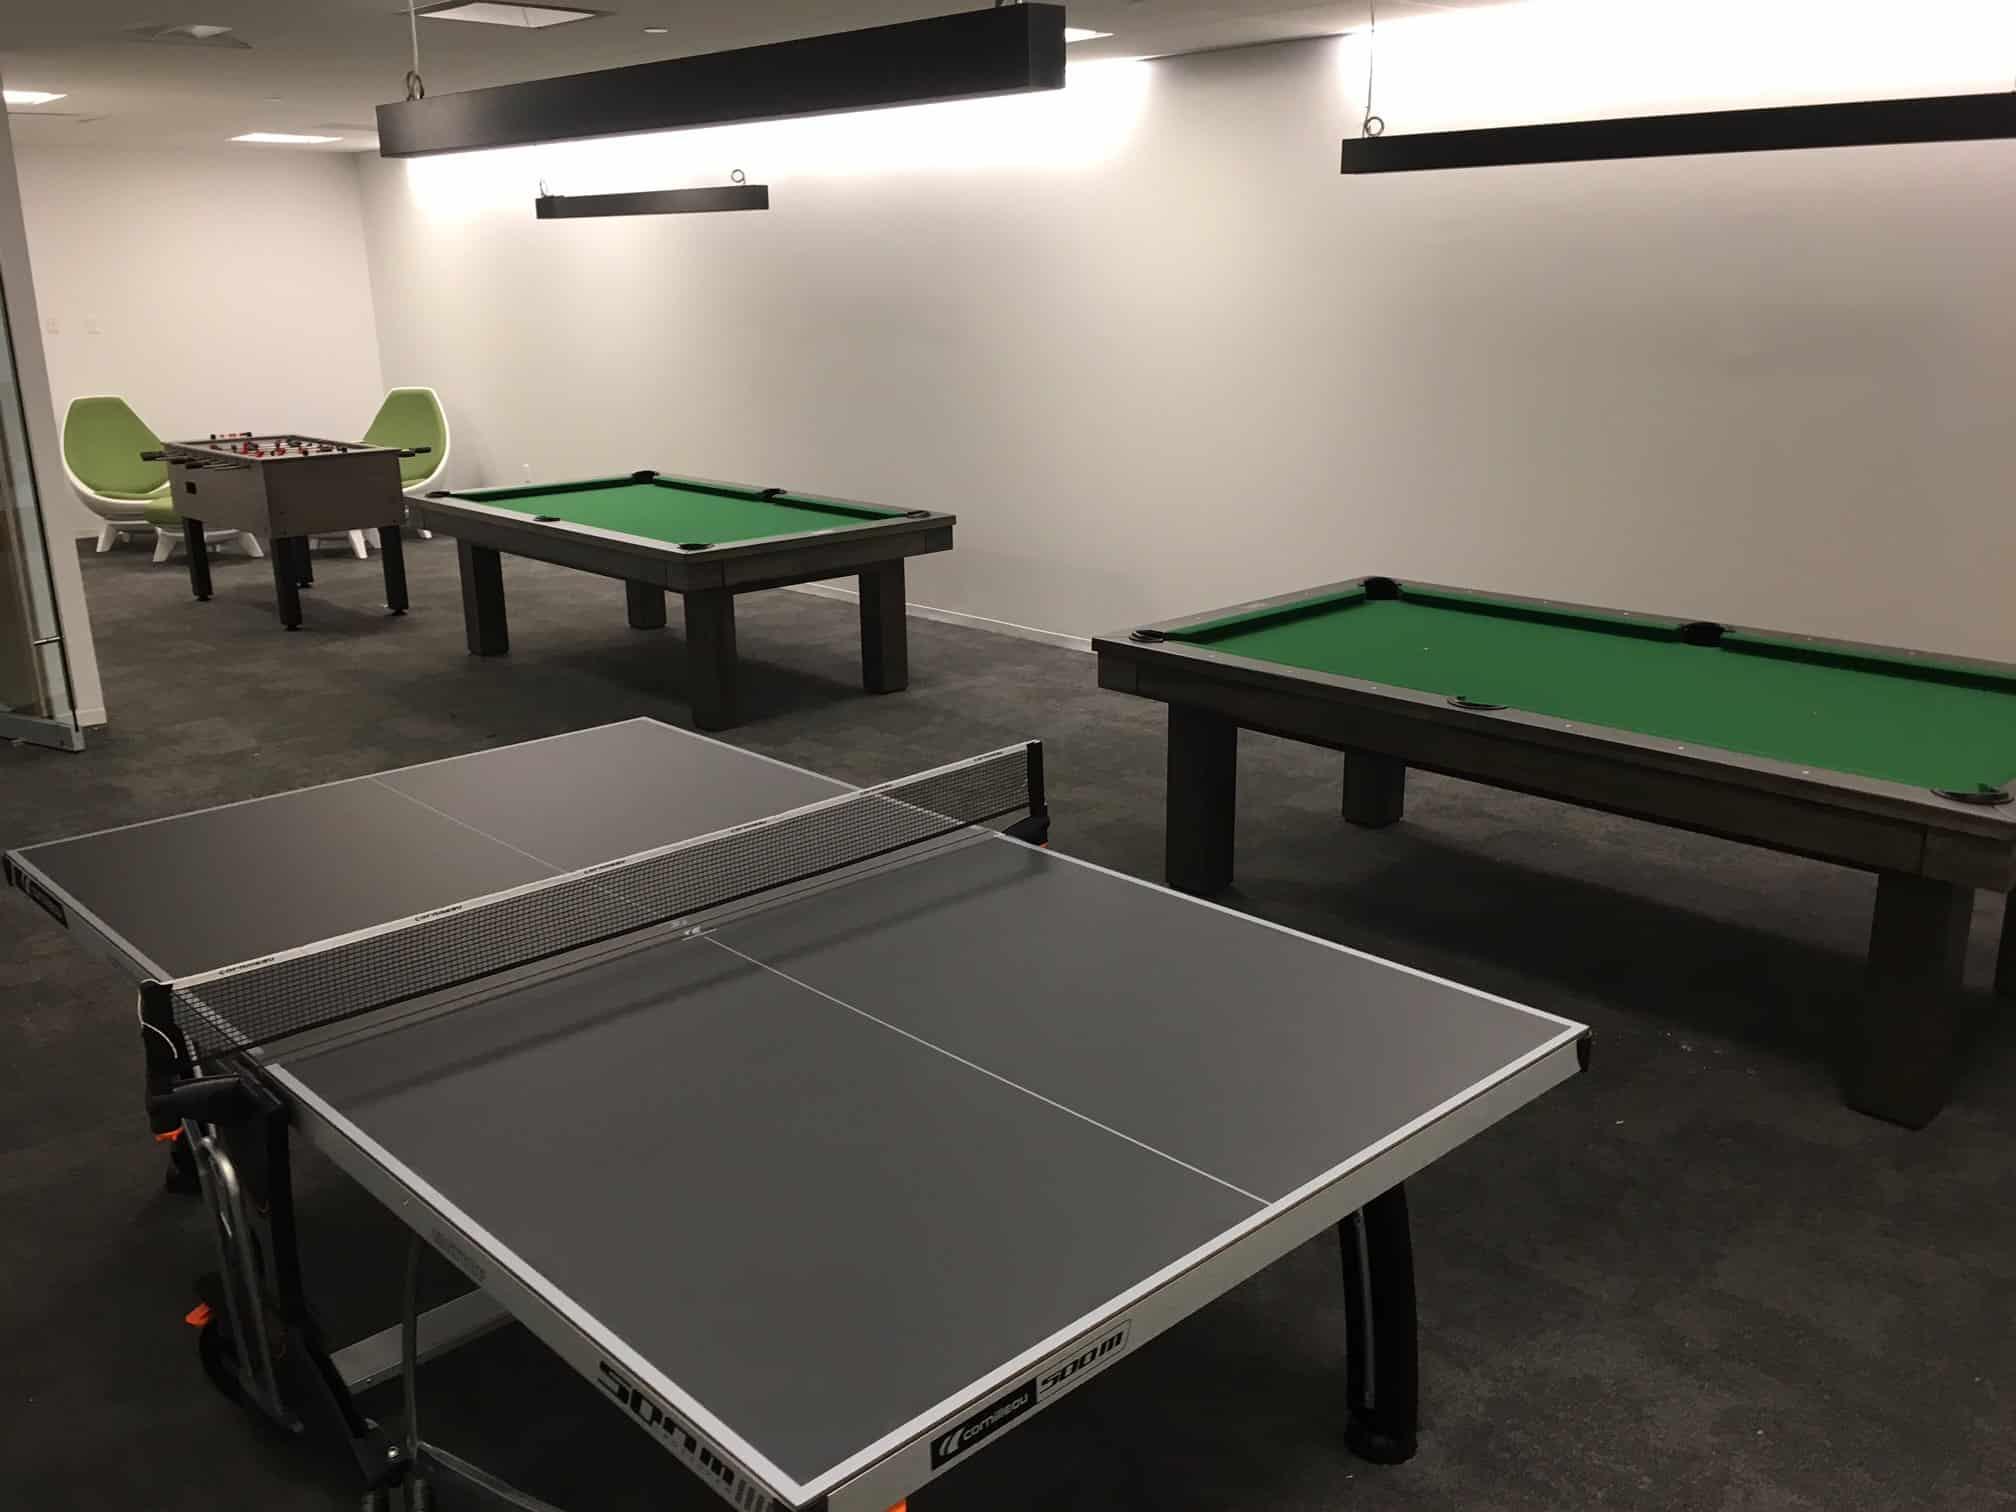 American Express Corporate Game Room Boynton Billiards